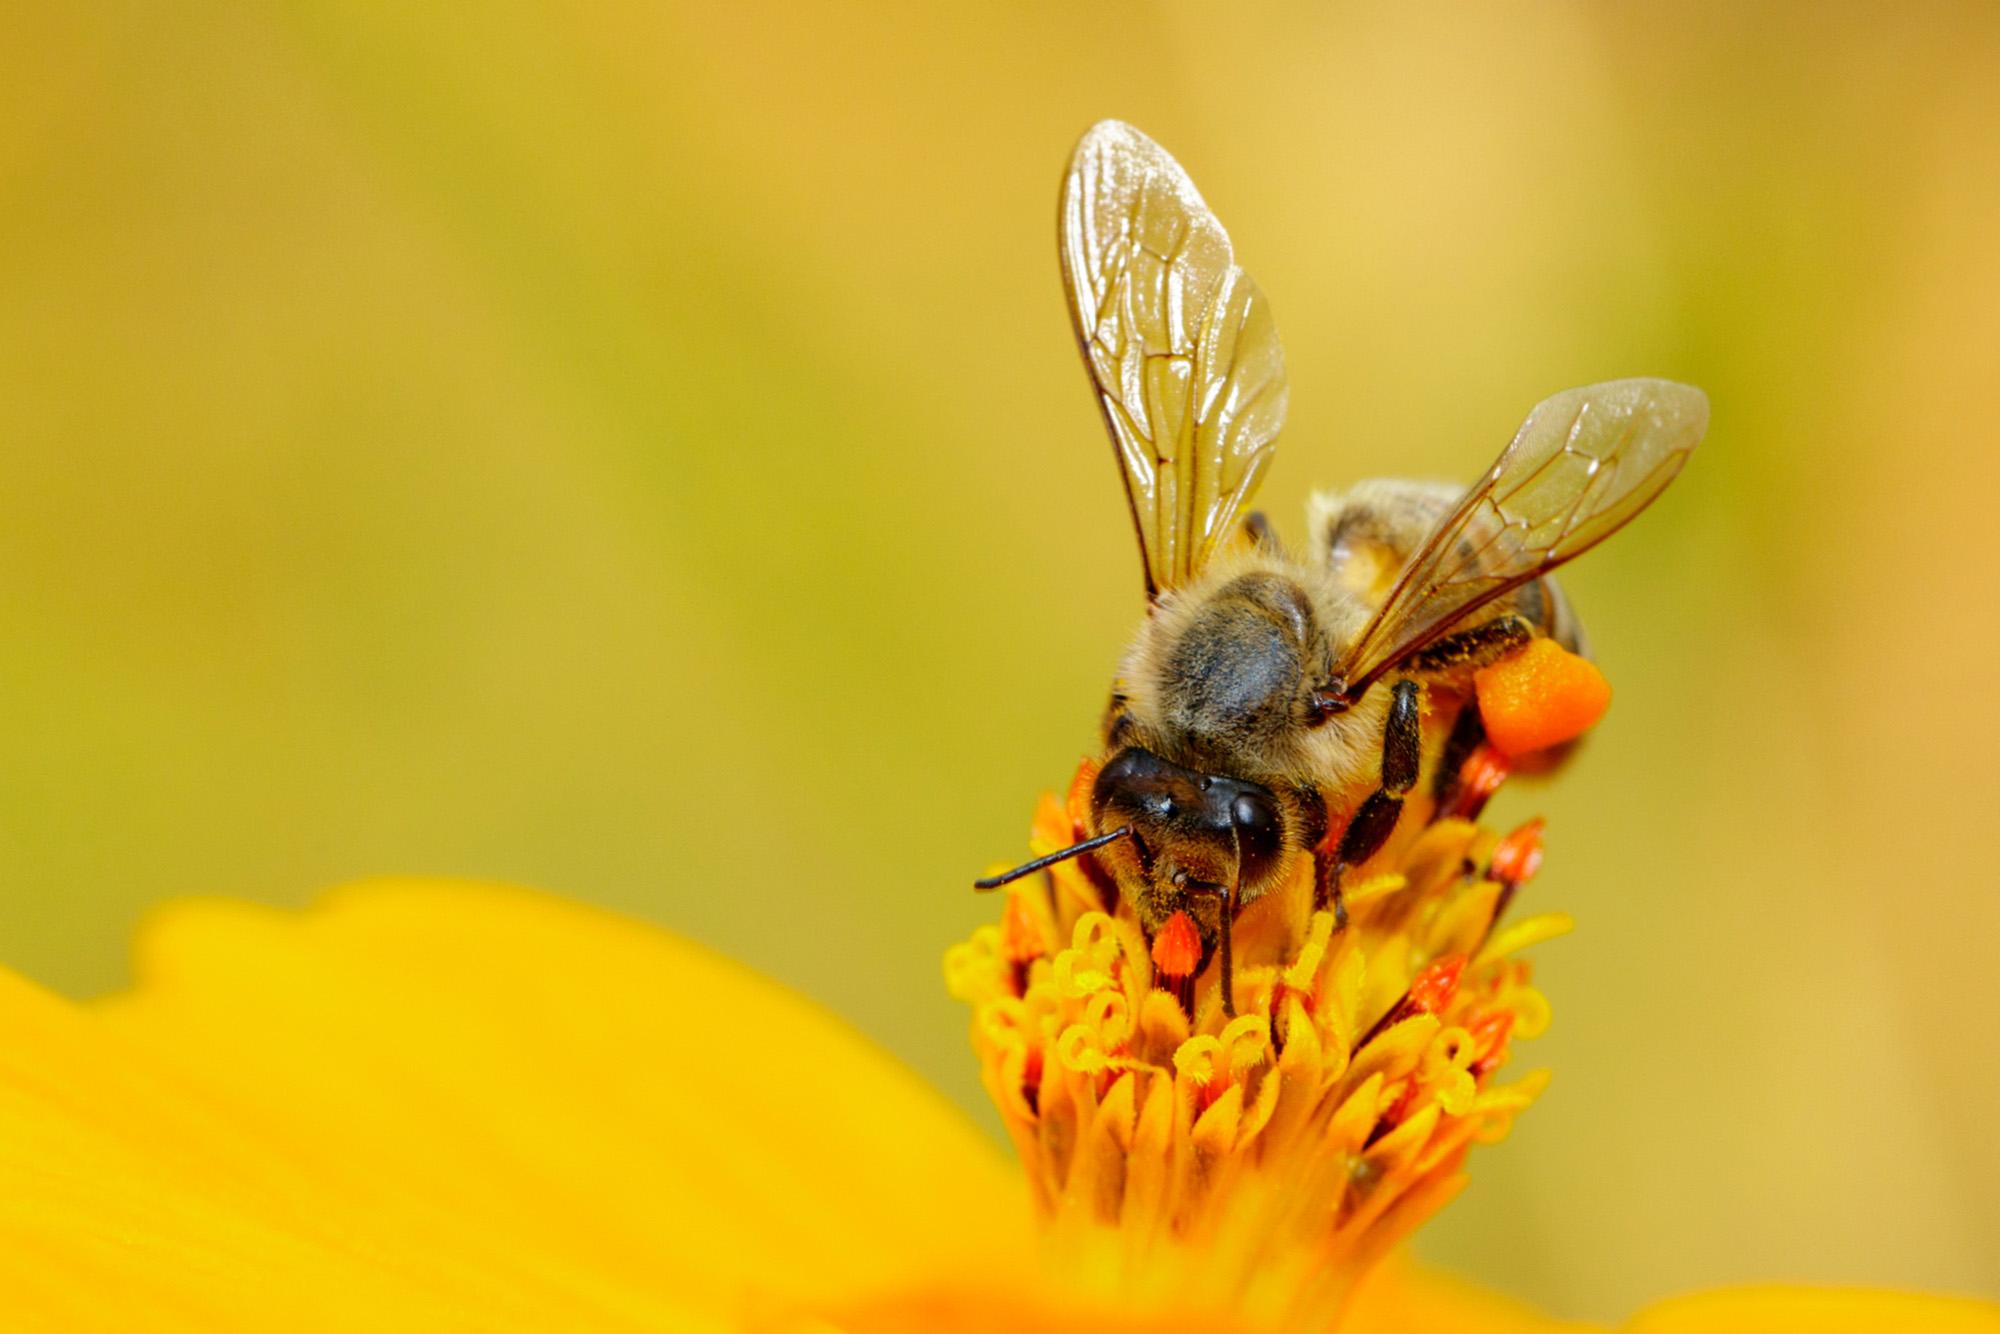 Golden honeybee-72 ppi